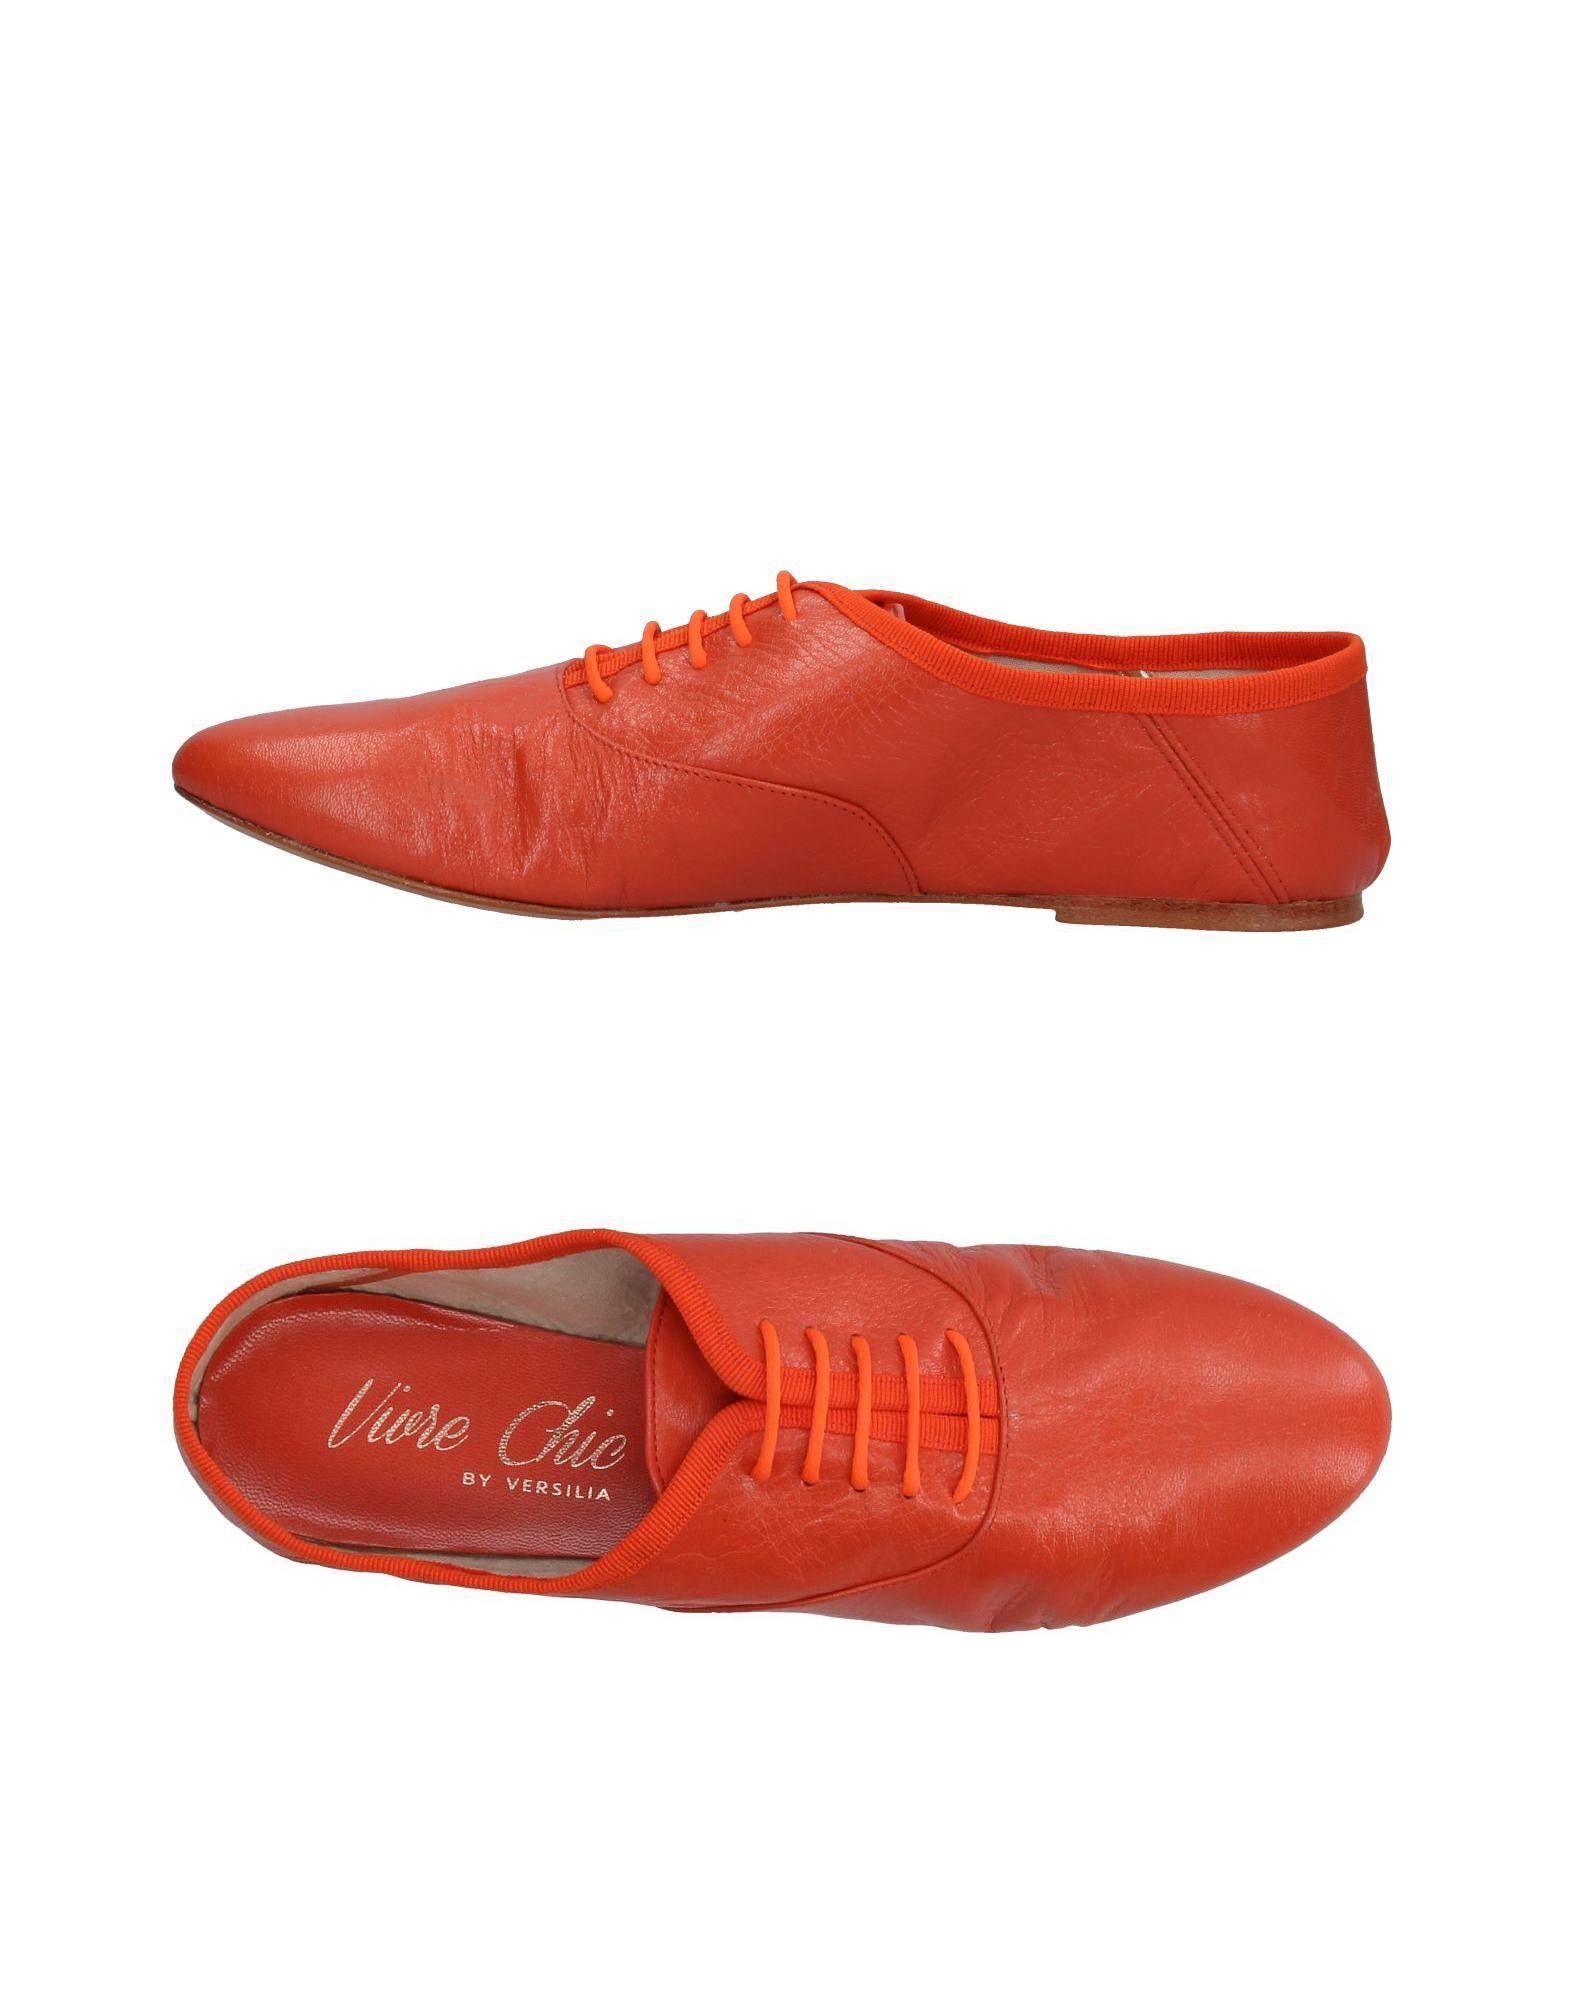 VIVERE CHIC by VERSILIA Обувь на шнурках балетки versilia туфли на каблуке